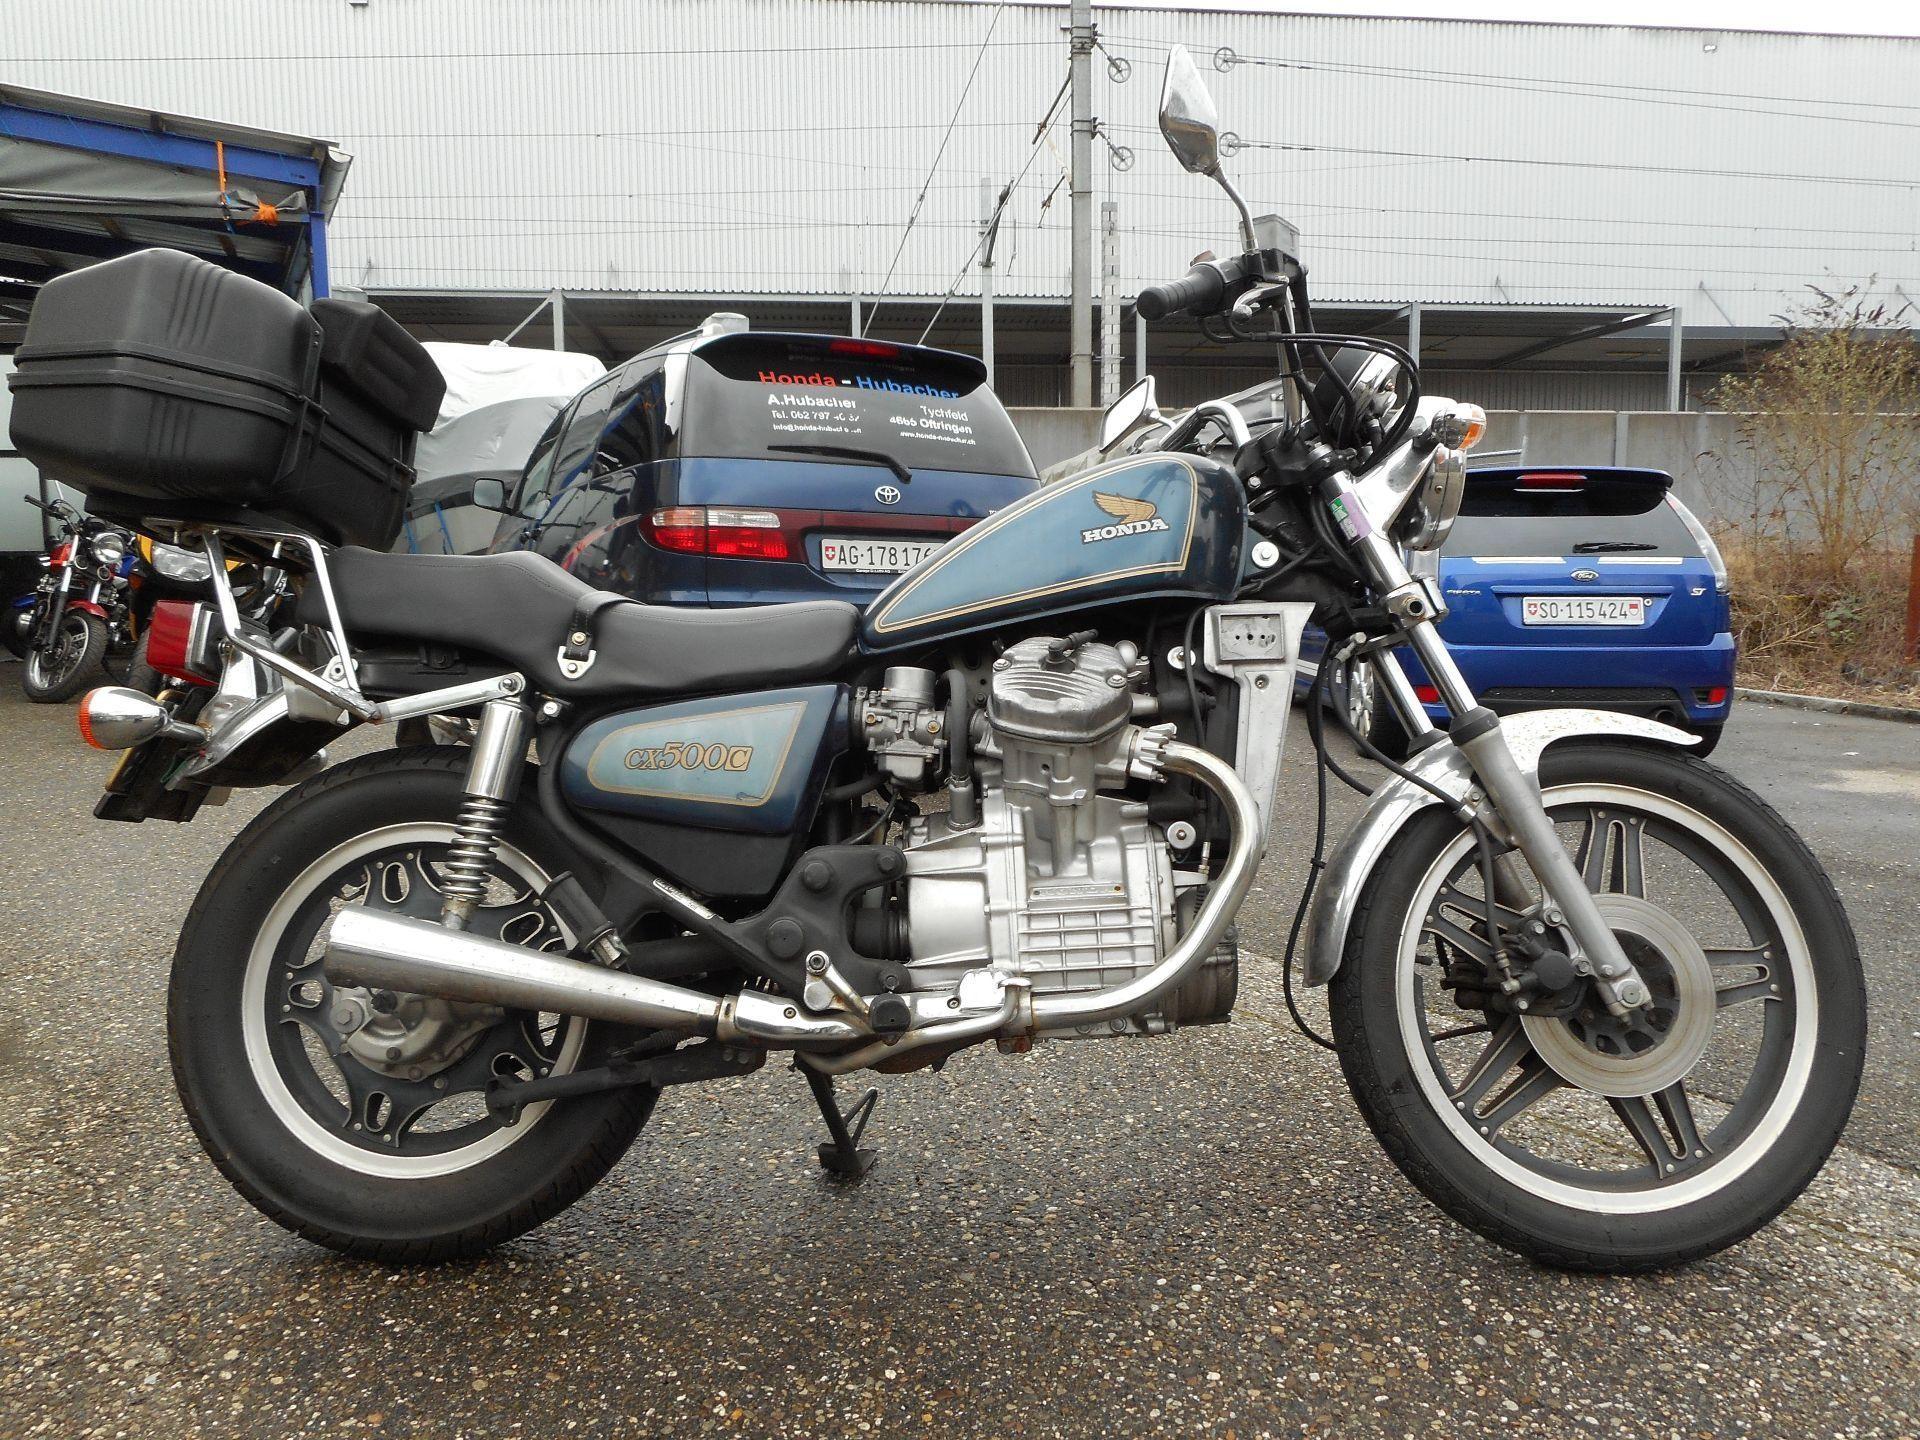 Motorrad Mieten & Roller Mieten HONDA Spezial CX 500 C